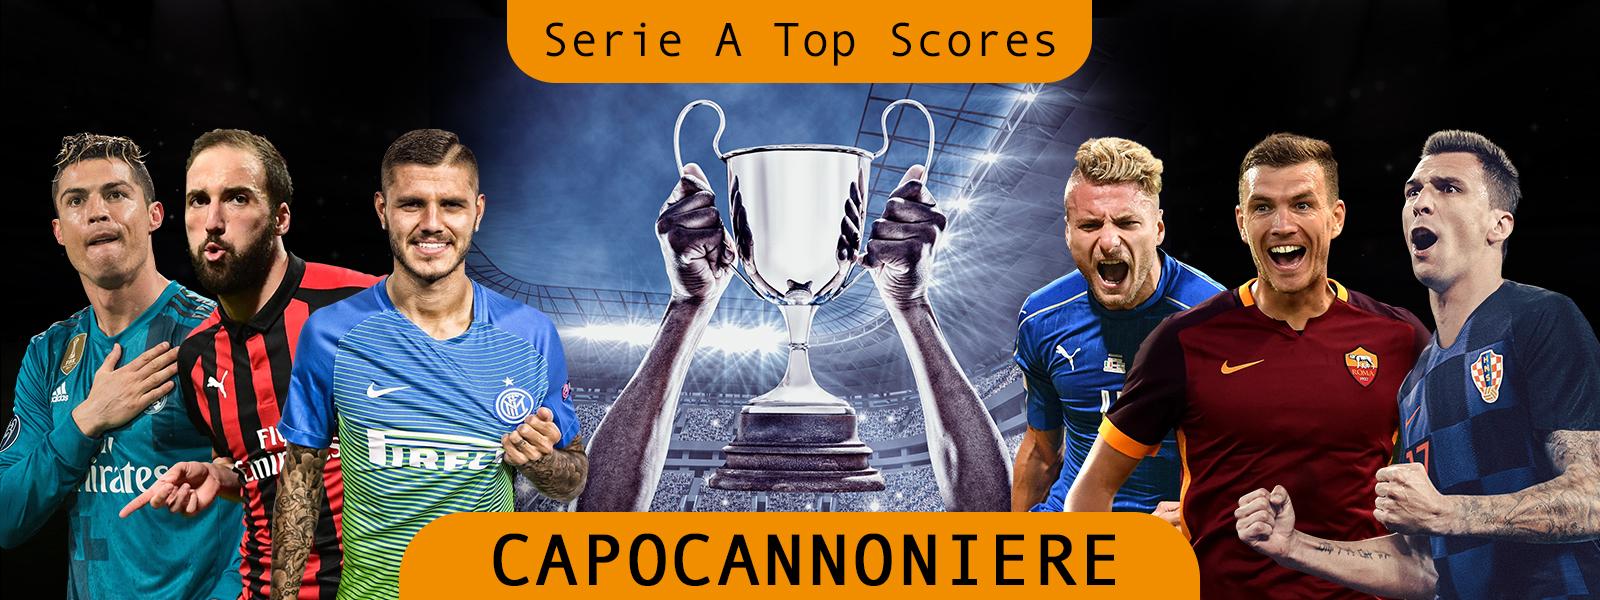 Serie A Top Scores - Capocannoniere Award